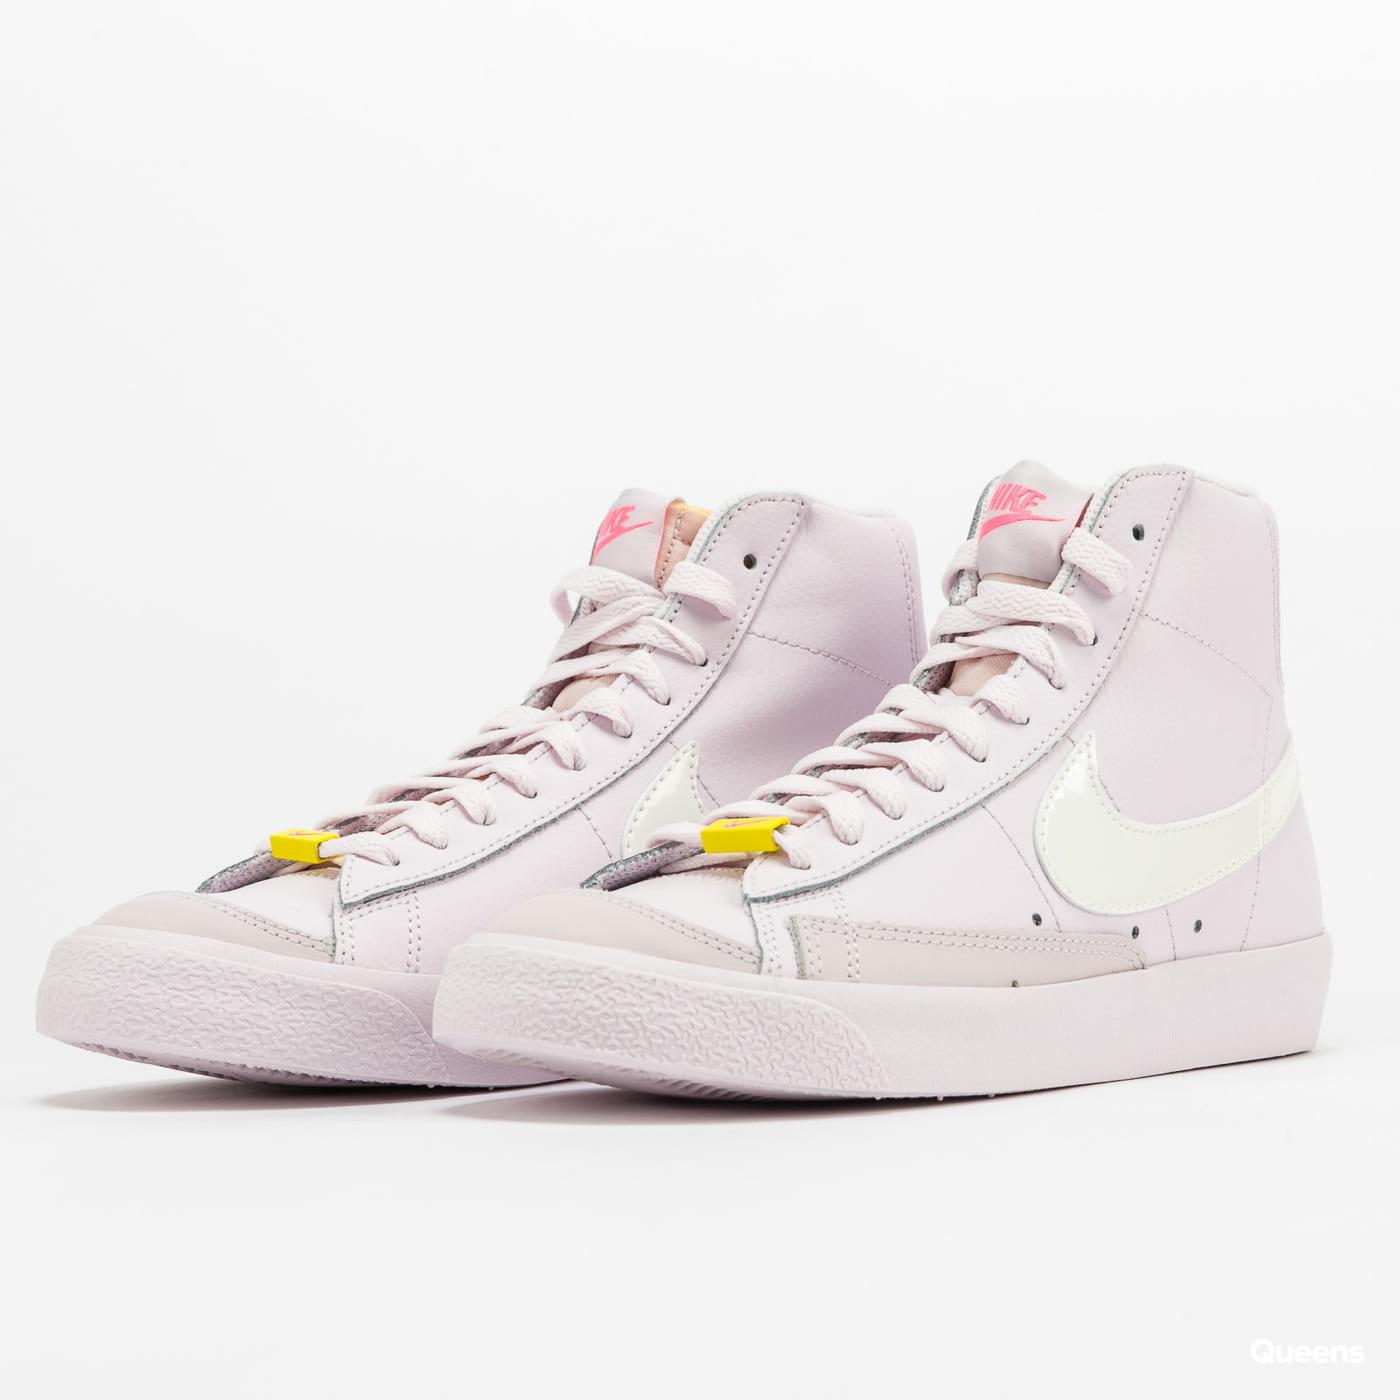 Nike WMNS Blazer Mid '77 violet / sail - digital pink (CZ0376-500 ...